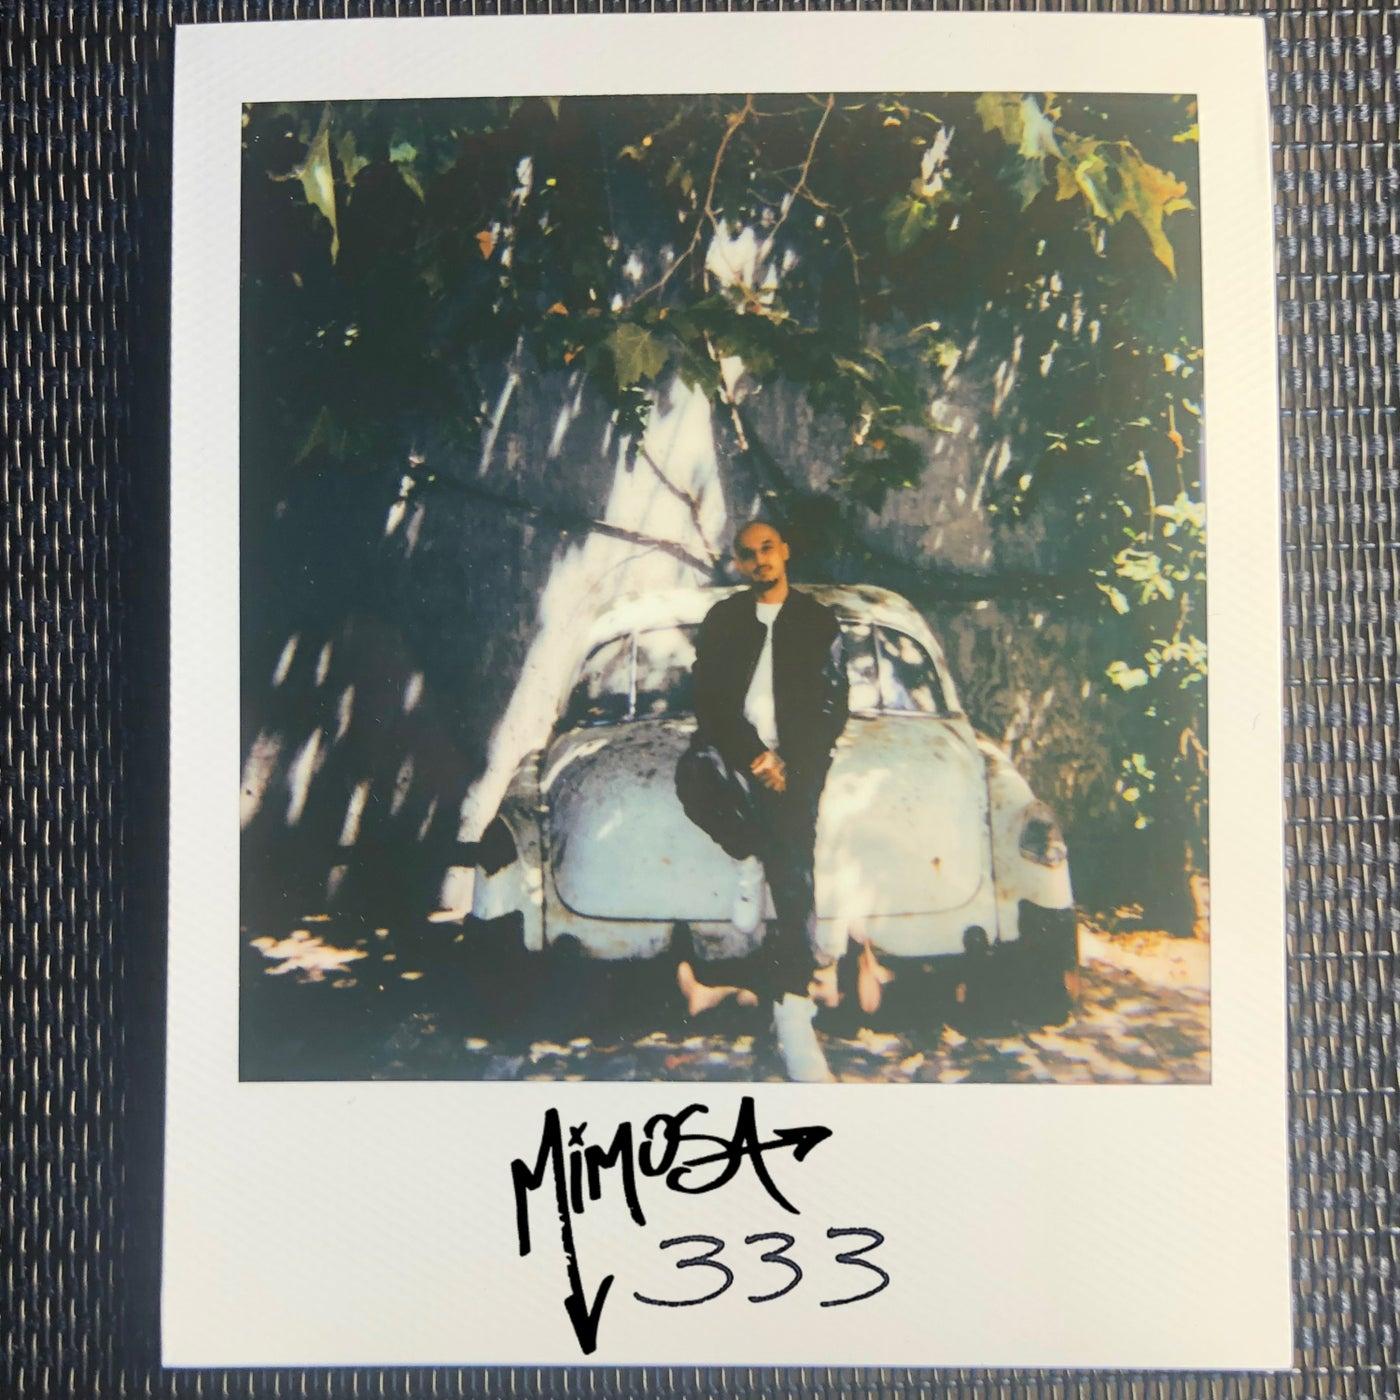 333 (Original Mix)